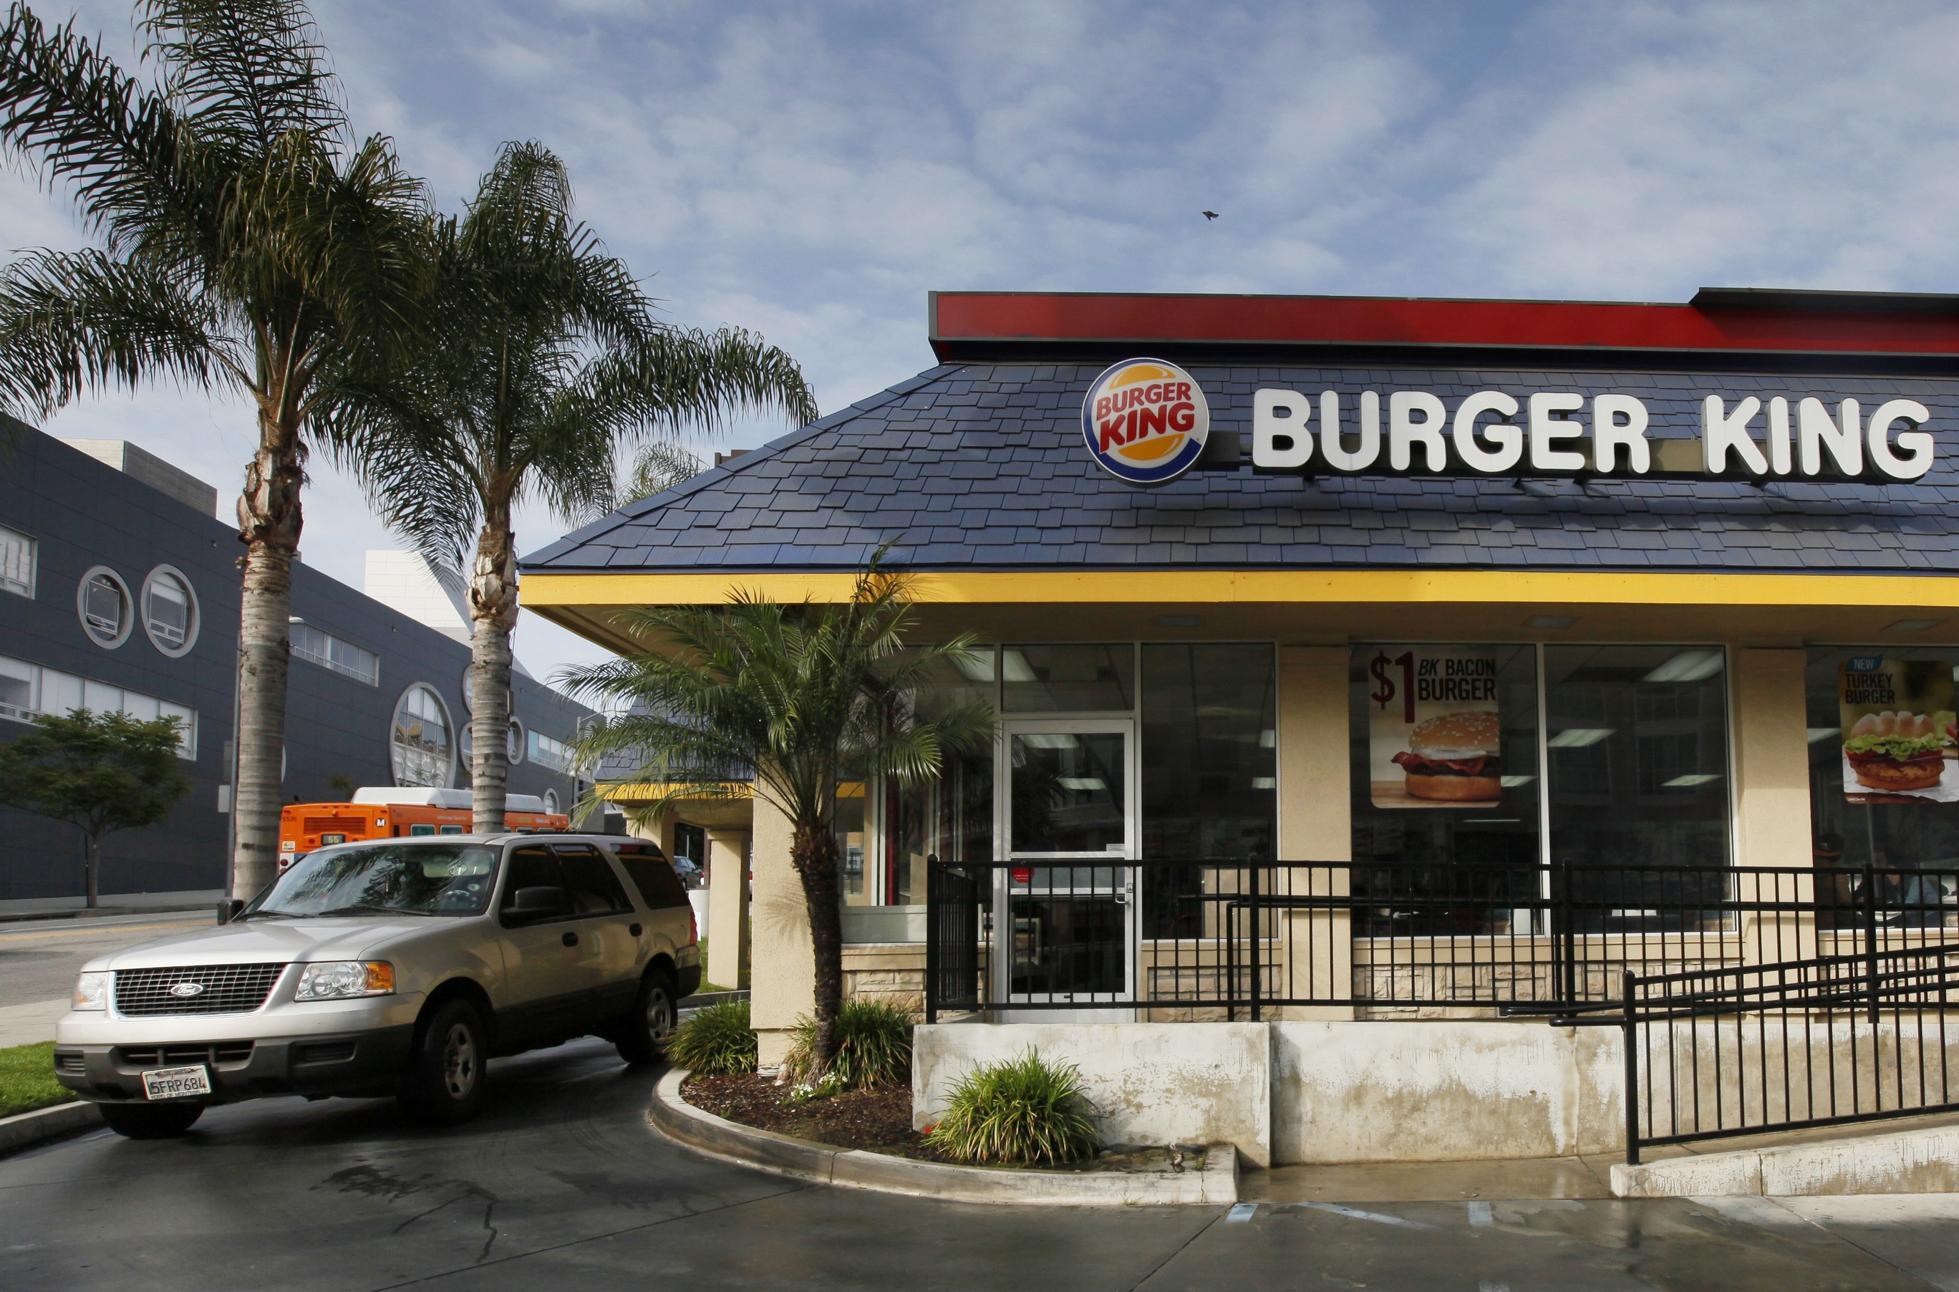 Burger King international women's day kitchen